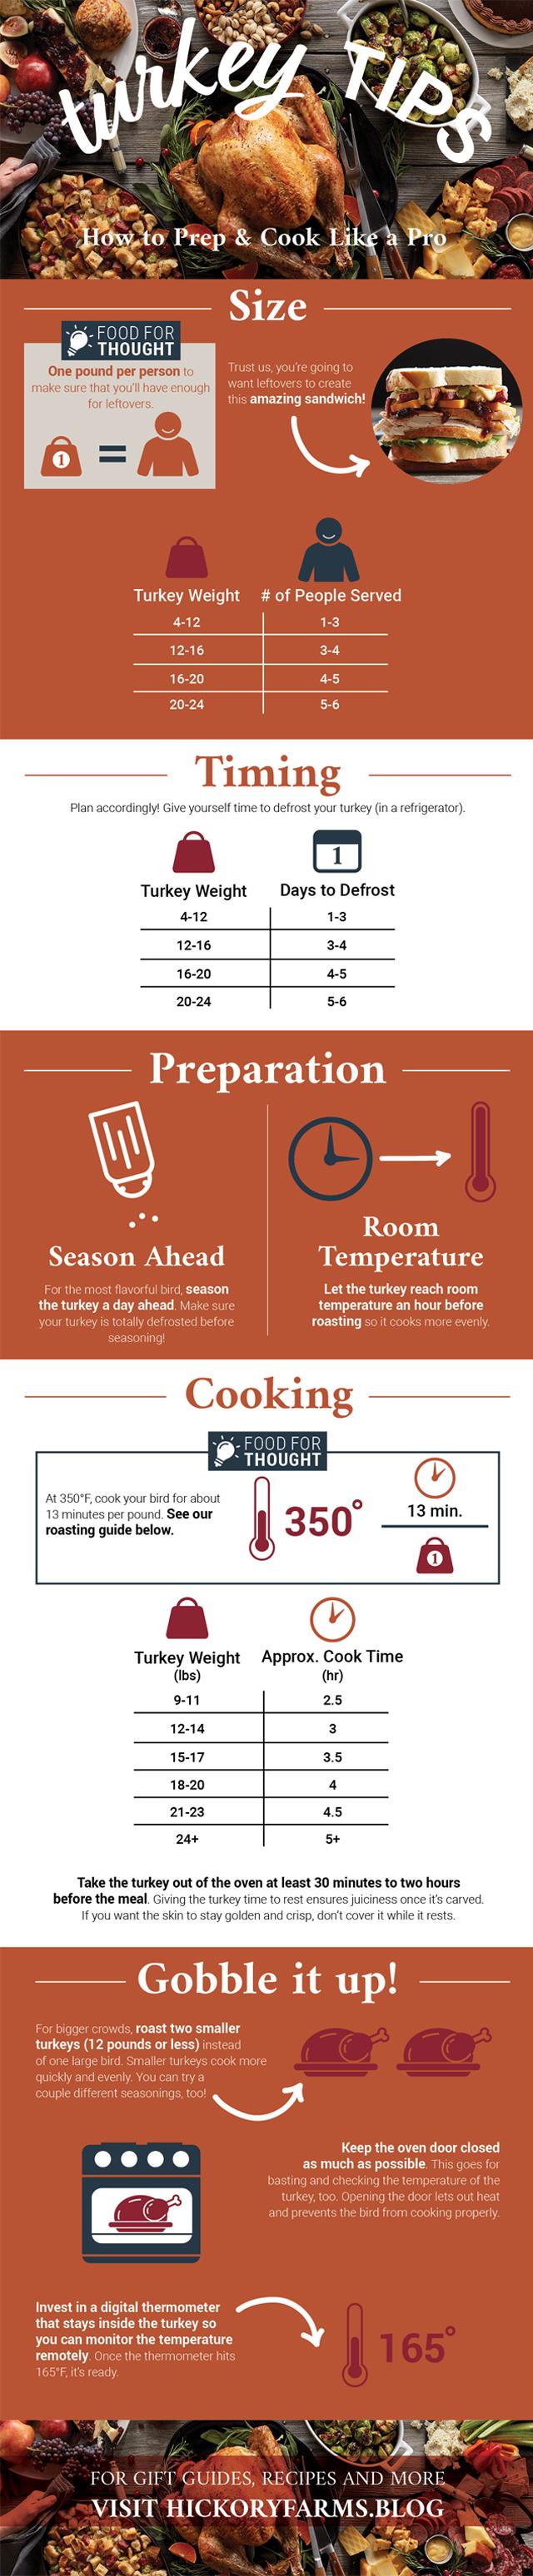 Thanksgiving turkey tips